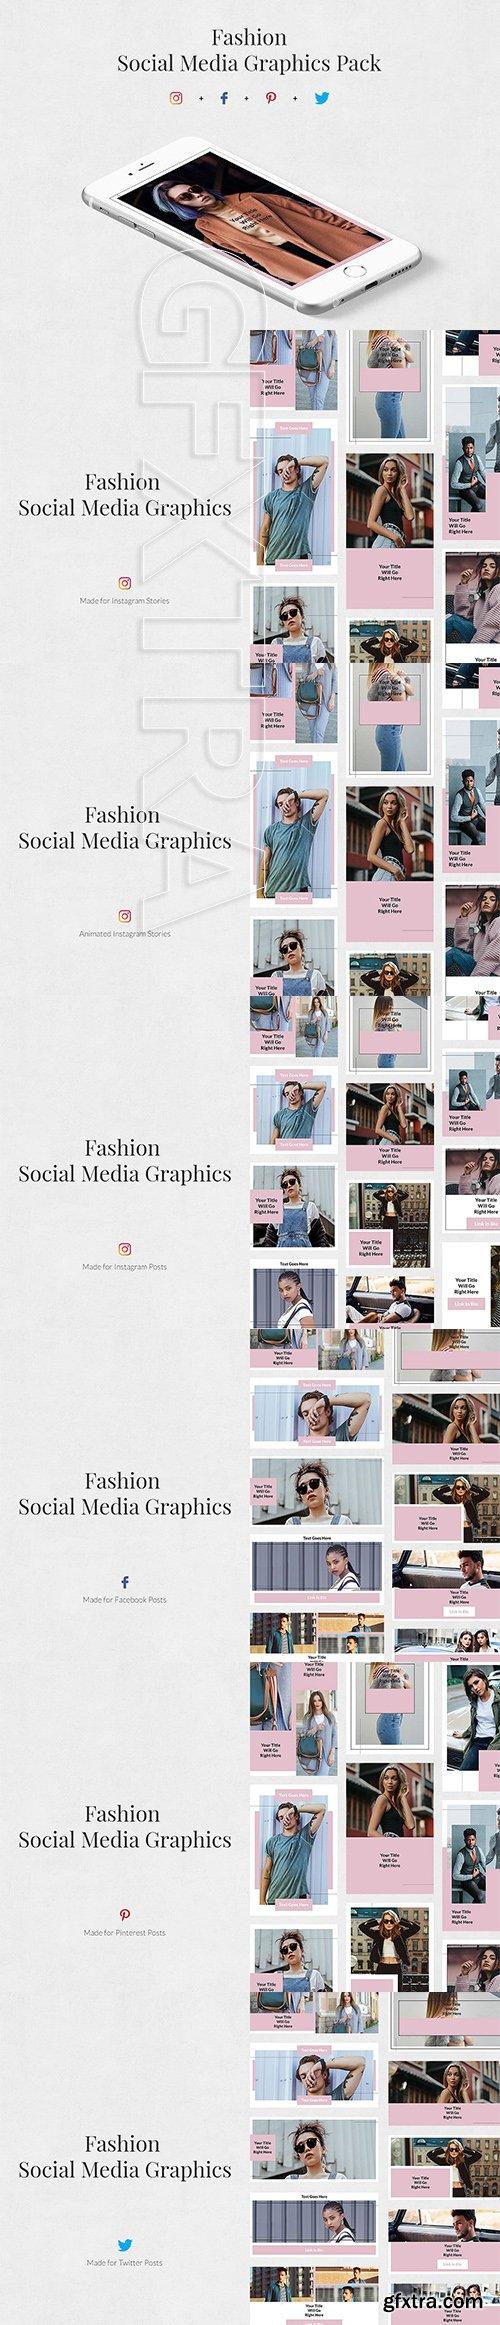 CreativeMarket - Fashion Pack 3170752